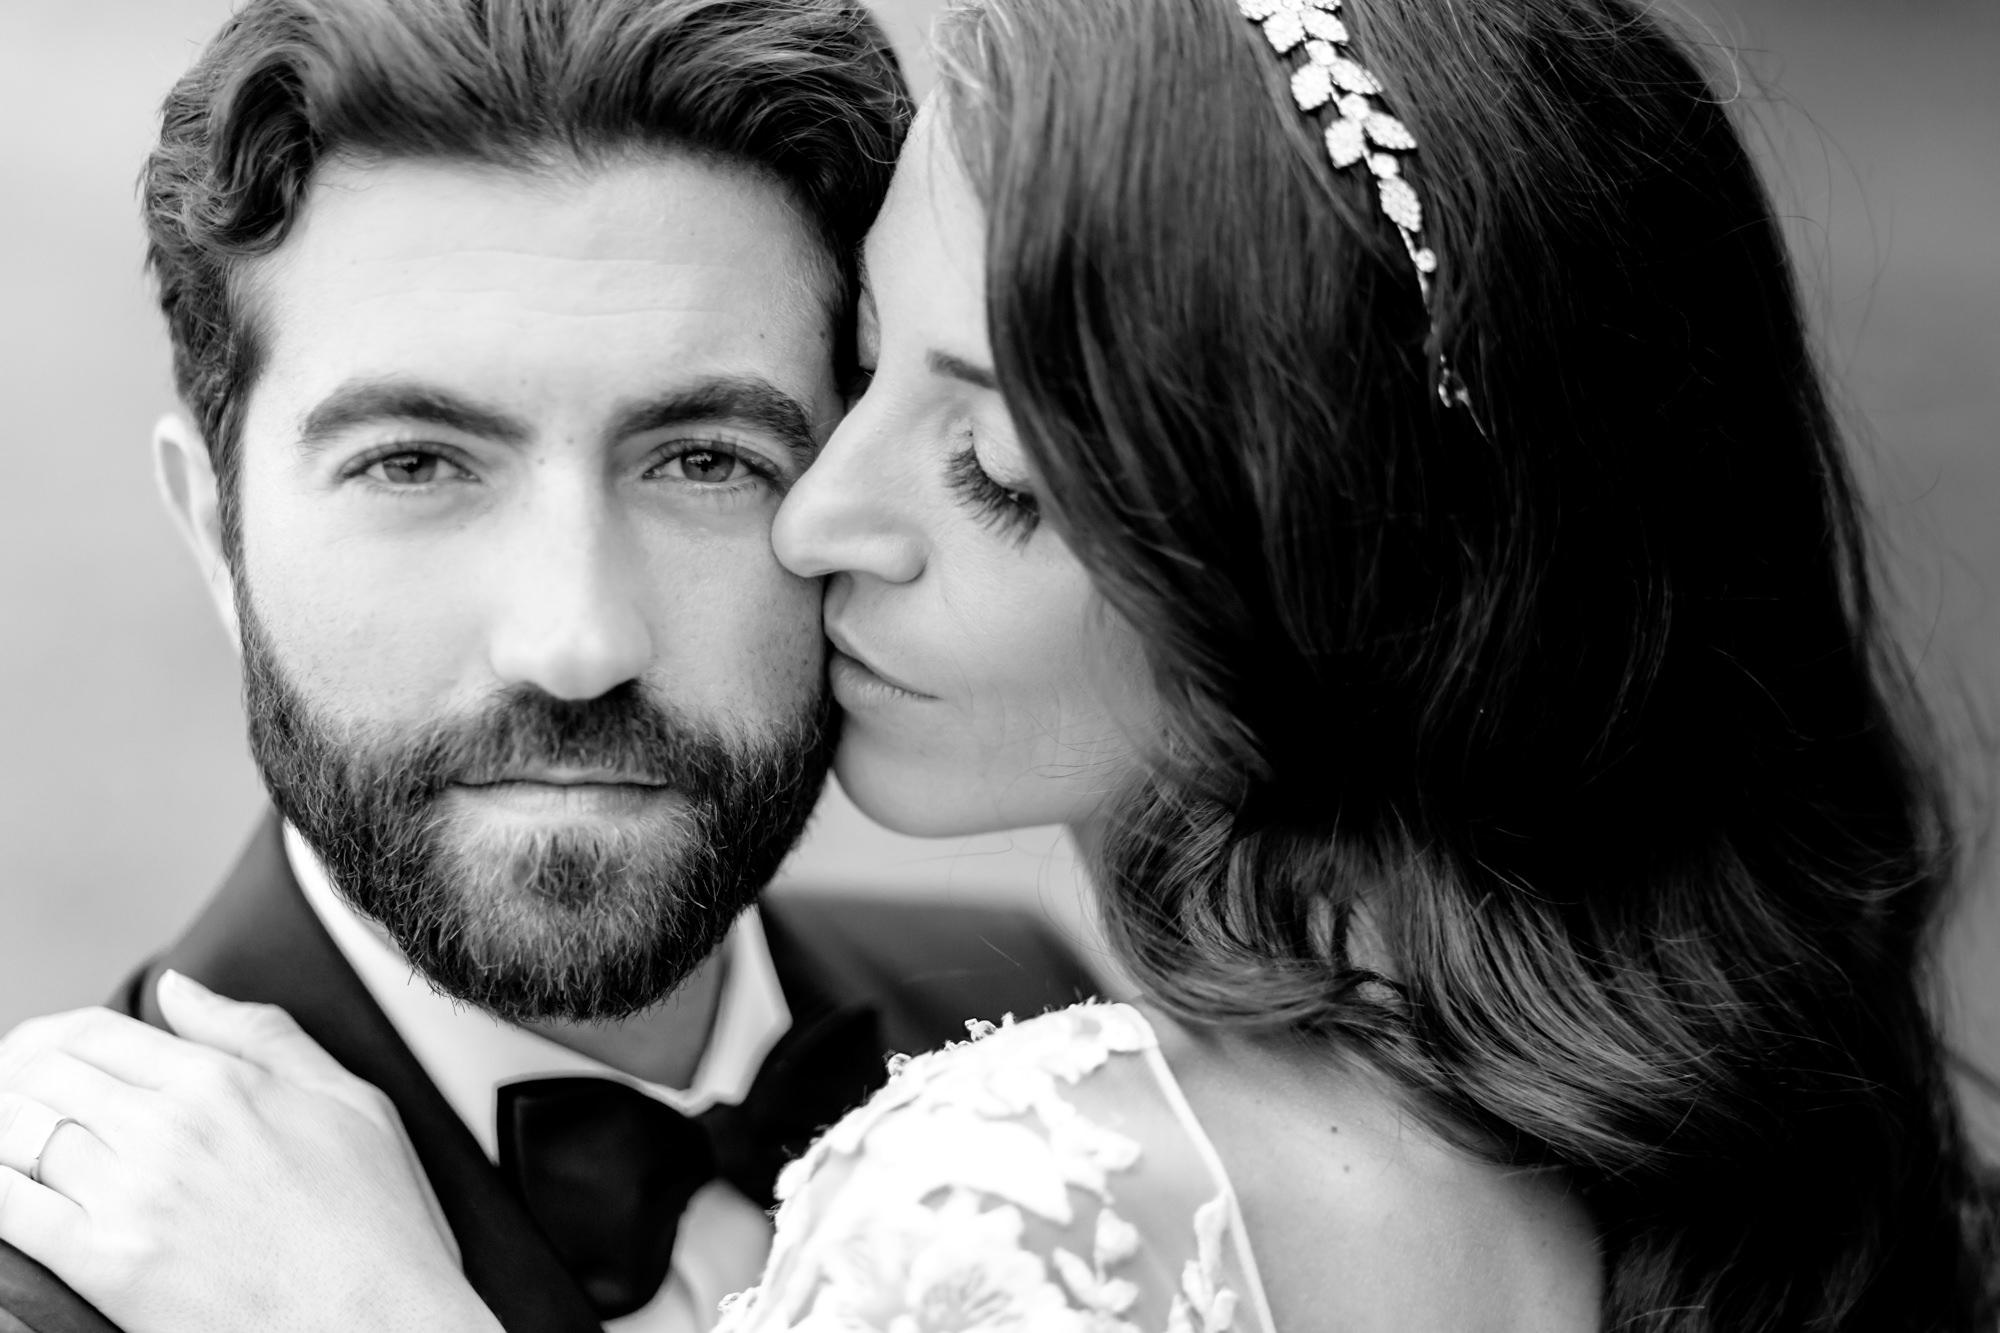 stunning-black-white-portrait-of-dark-haired-couple-groom-beard-worlds-best-wedding-photos-david-bastianoni-italy-wedding-photographers